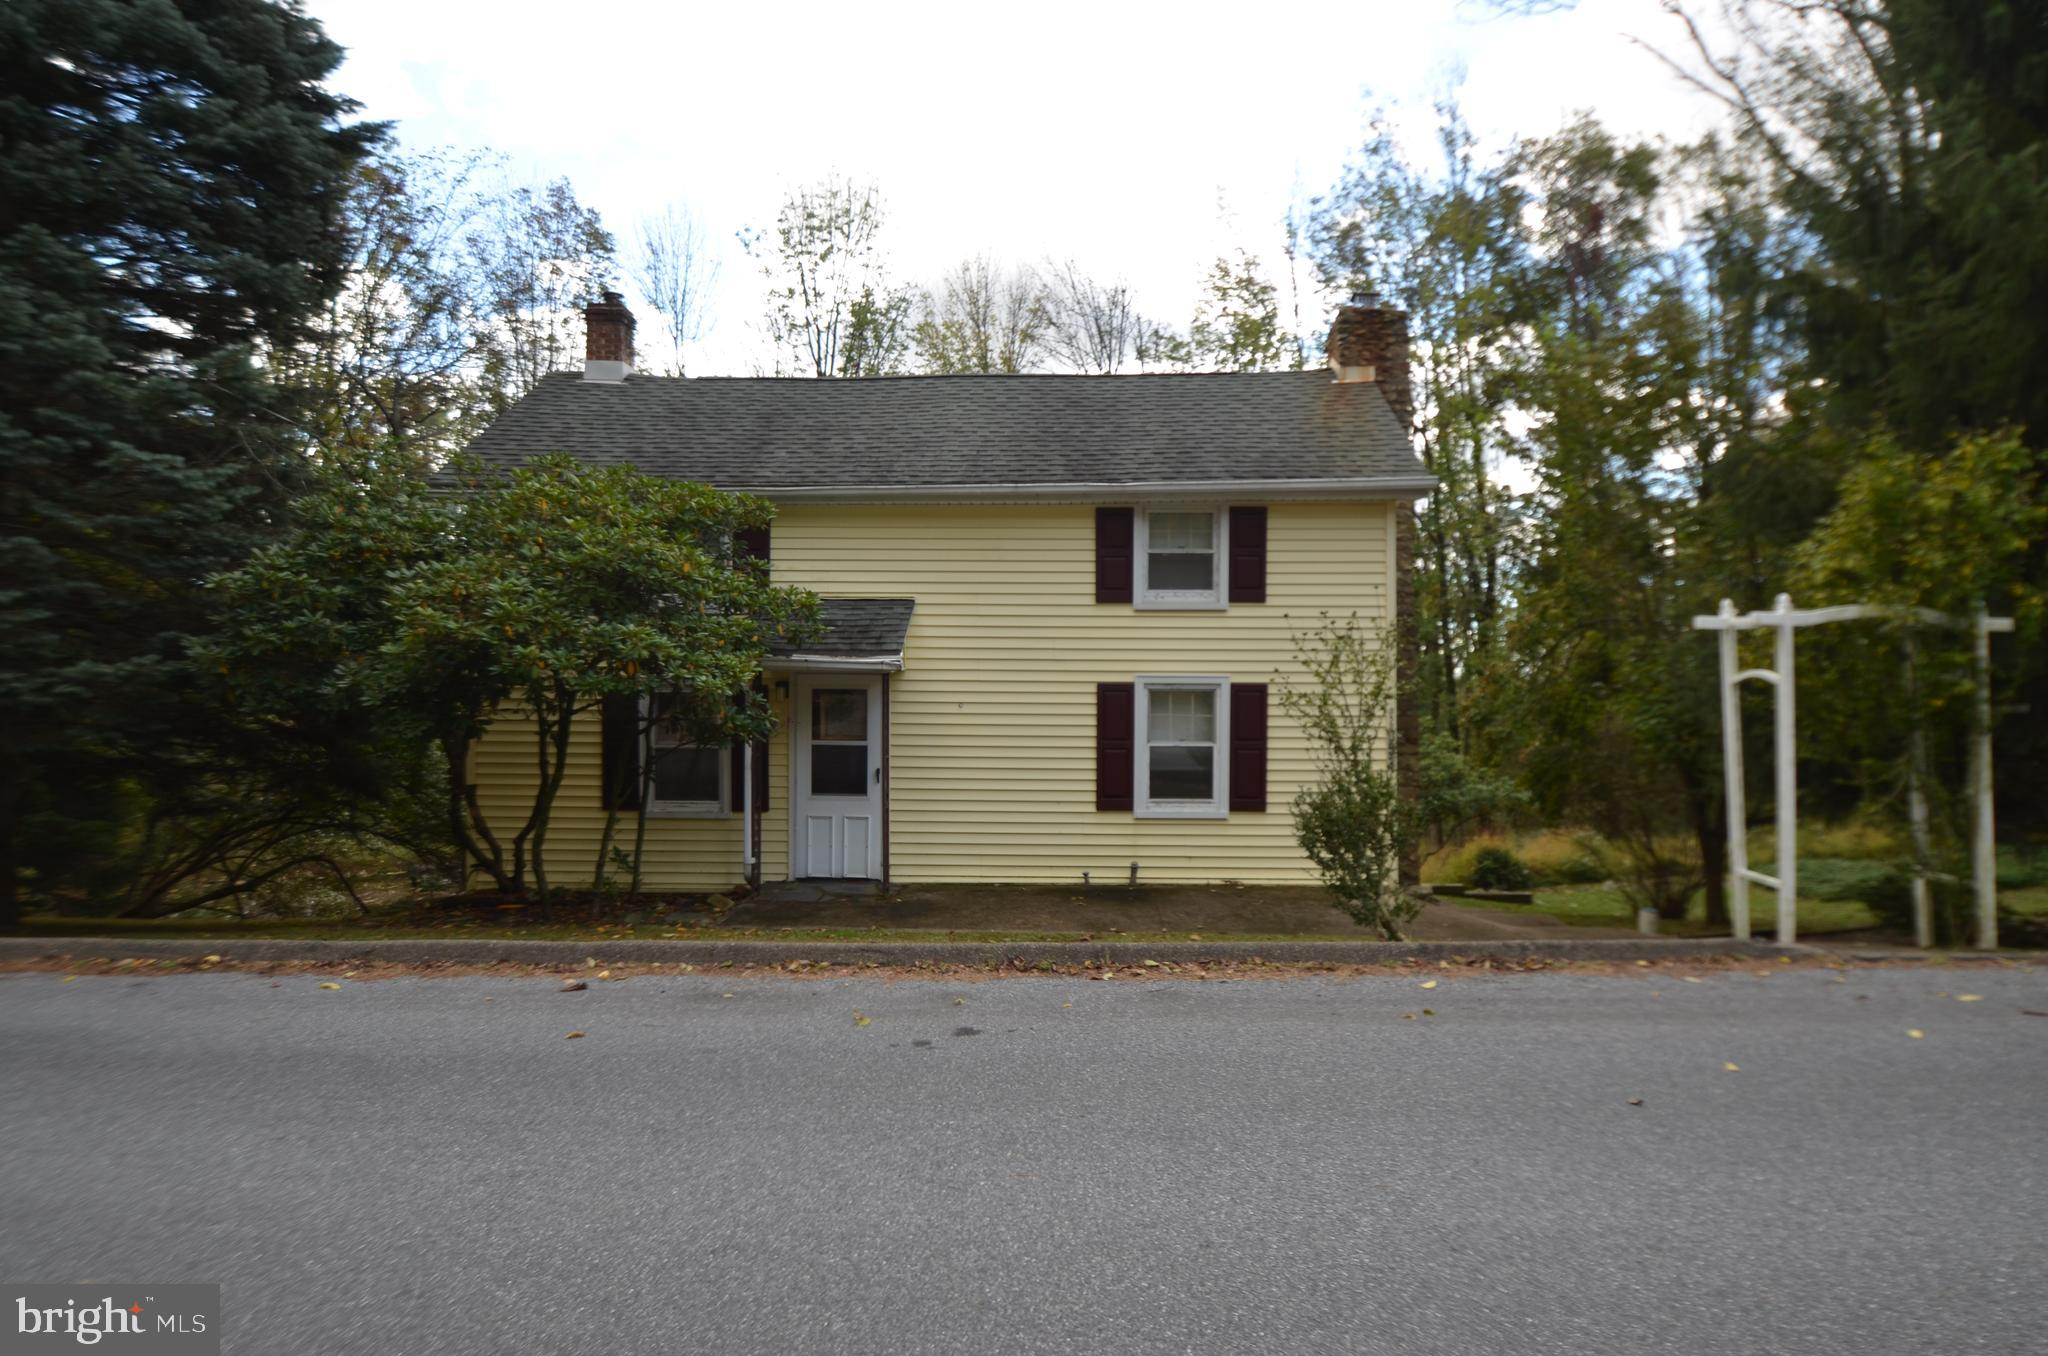 353 ELLIS ROAD, MILFORD, NJ 08848